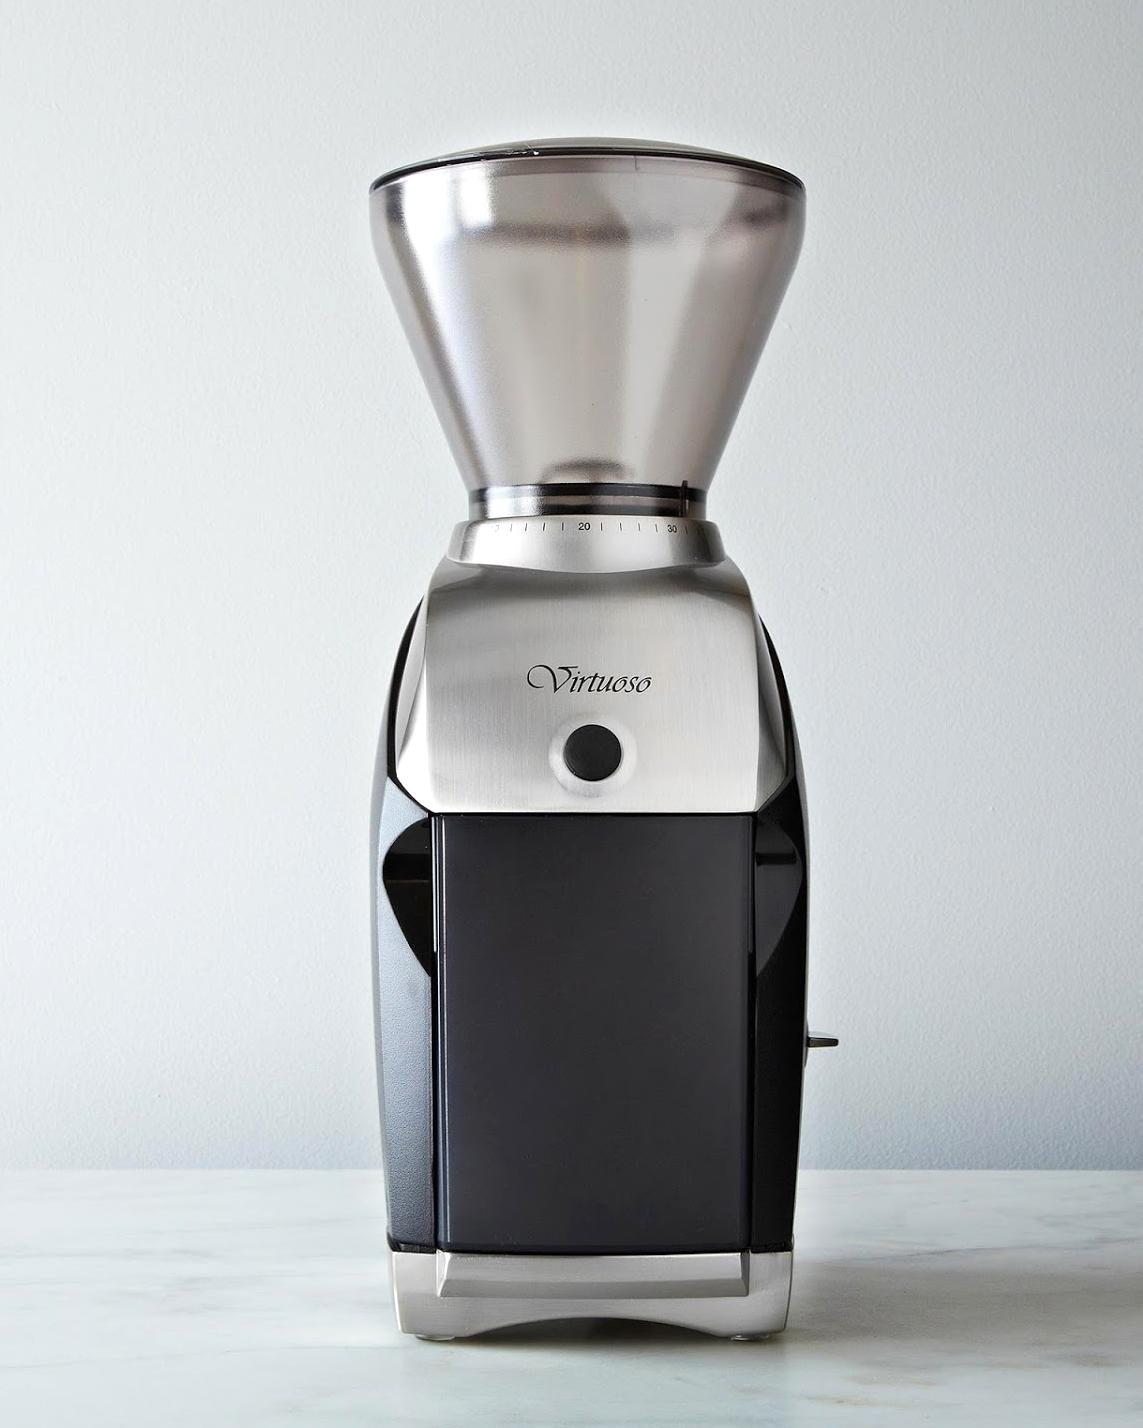 coffee-gift-guide-baratza-grinder-1014.jpg